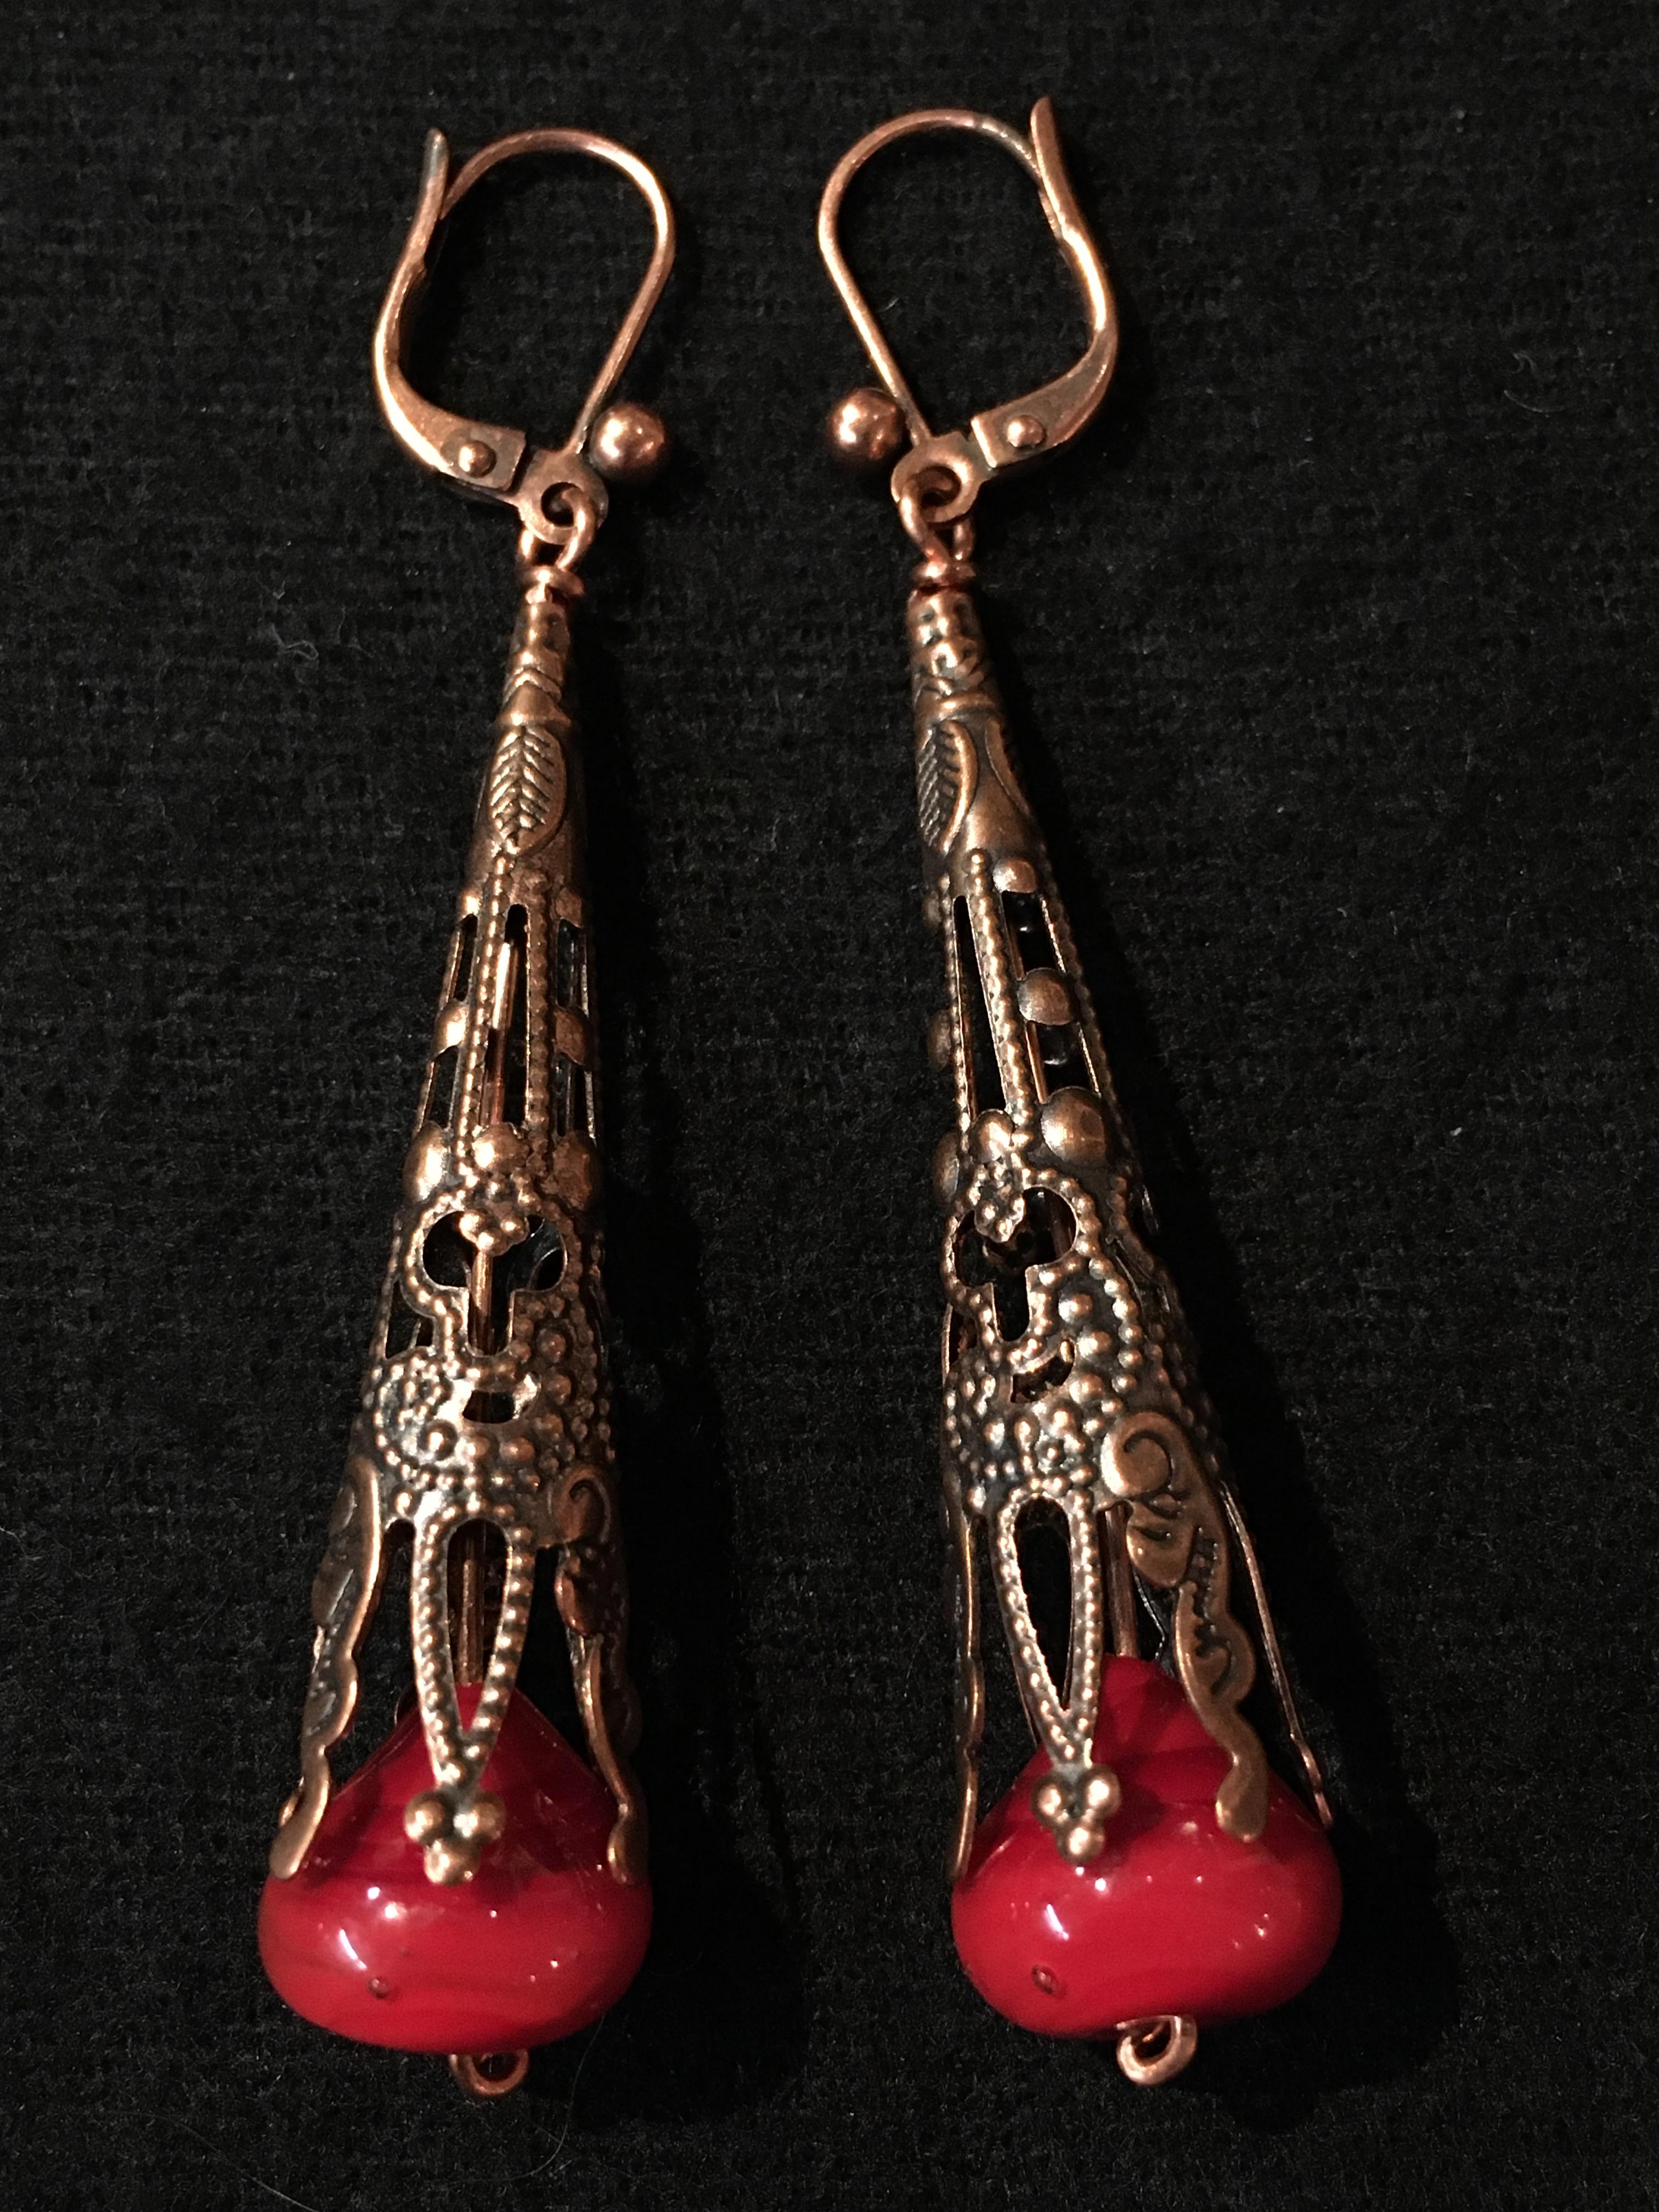 Boucles d'oreille ref. BO/MF03r/28€